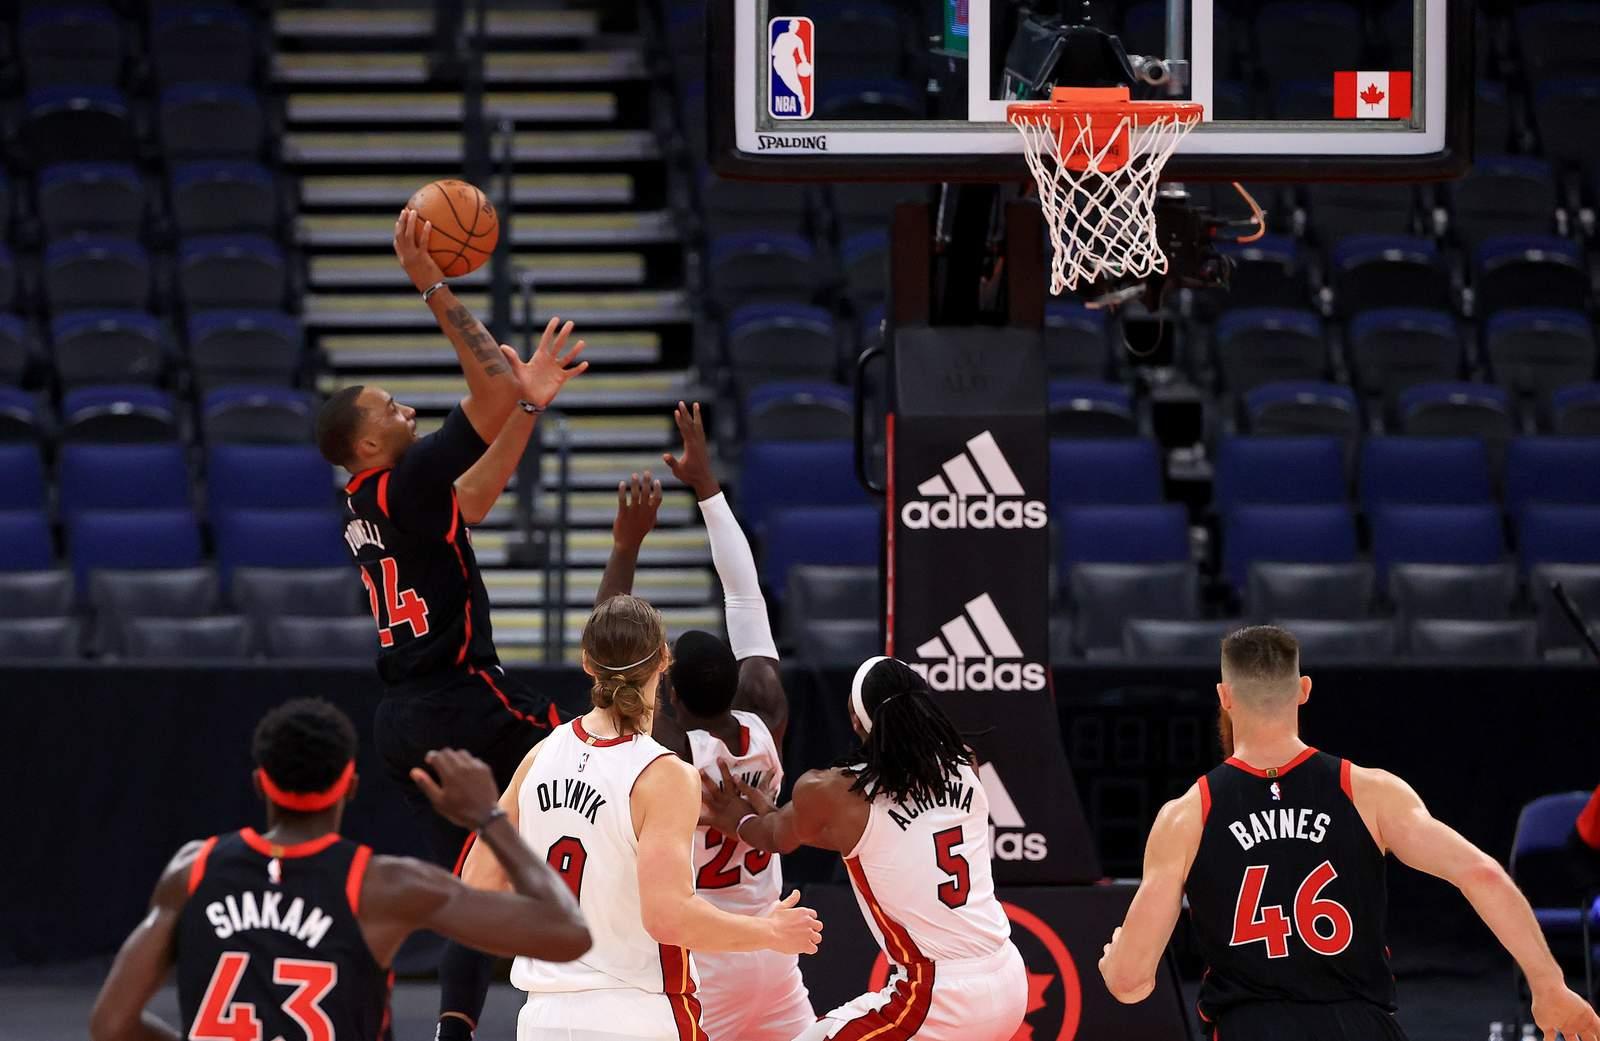 Heat comeback effort falls short, Raptors win 101-81